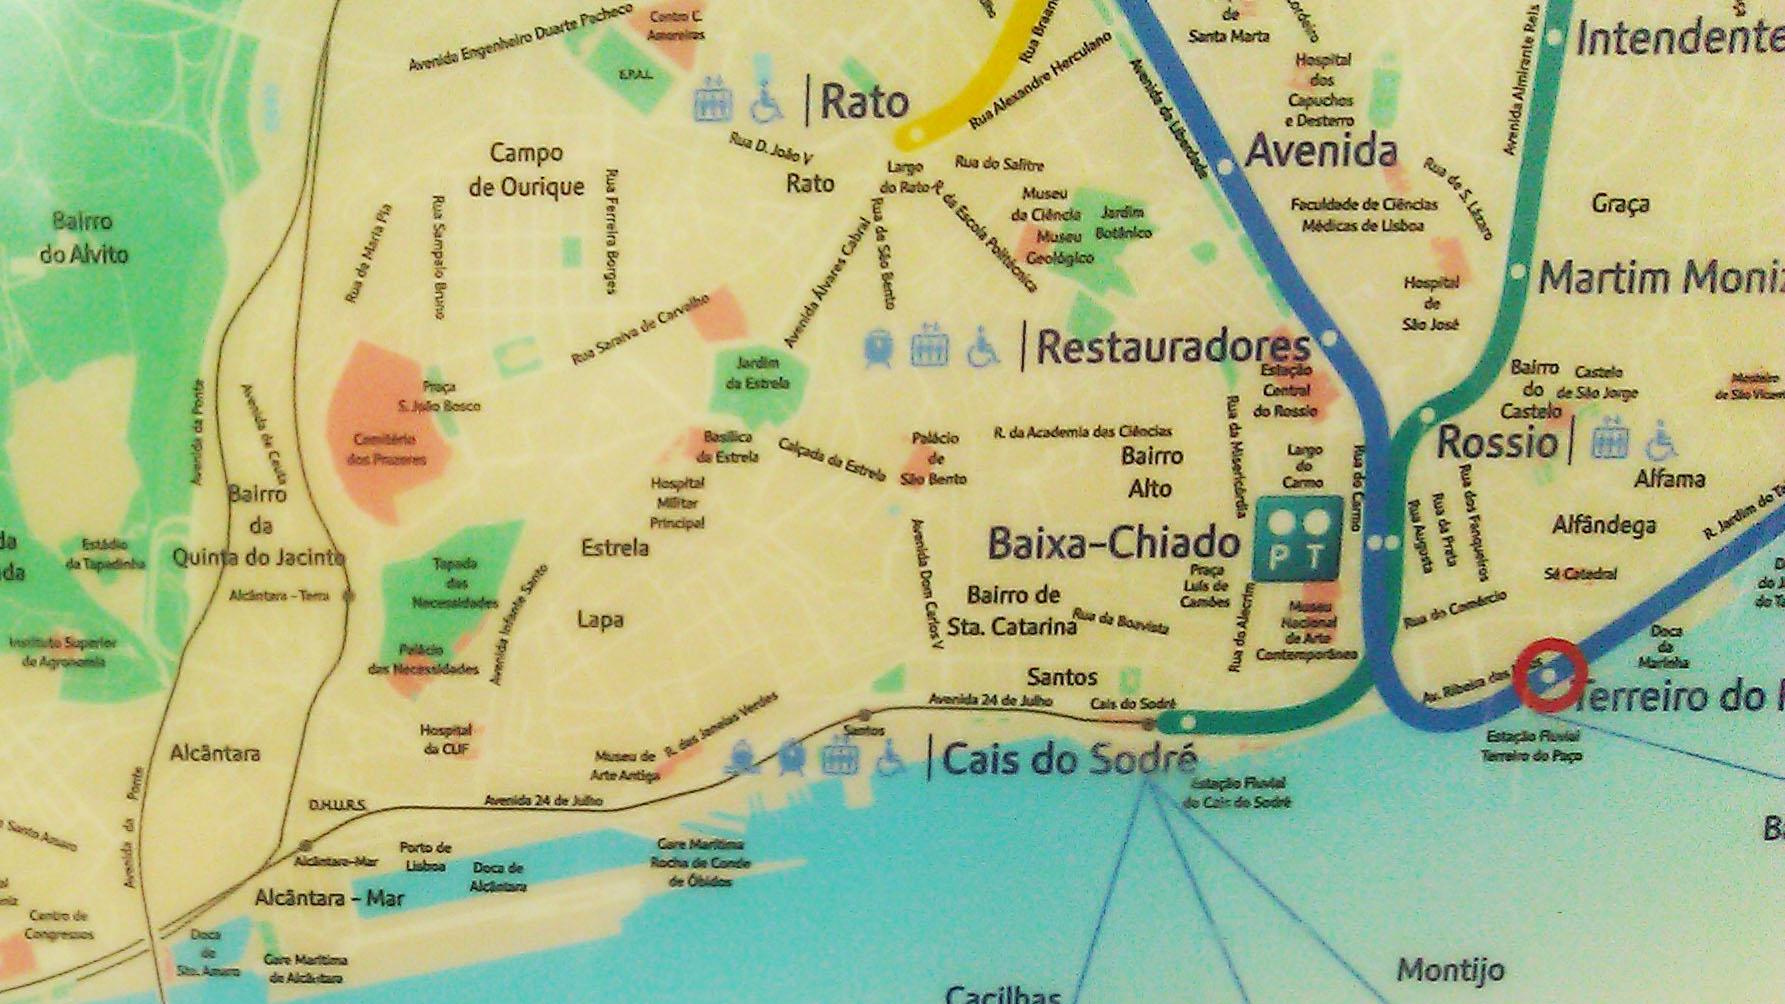 santa catarina lisboa mapa Mapa de trenes de Lisboa santa catarina lisboa mapa